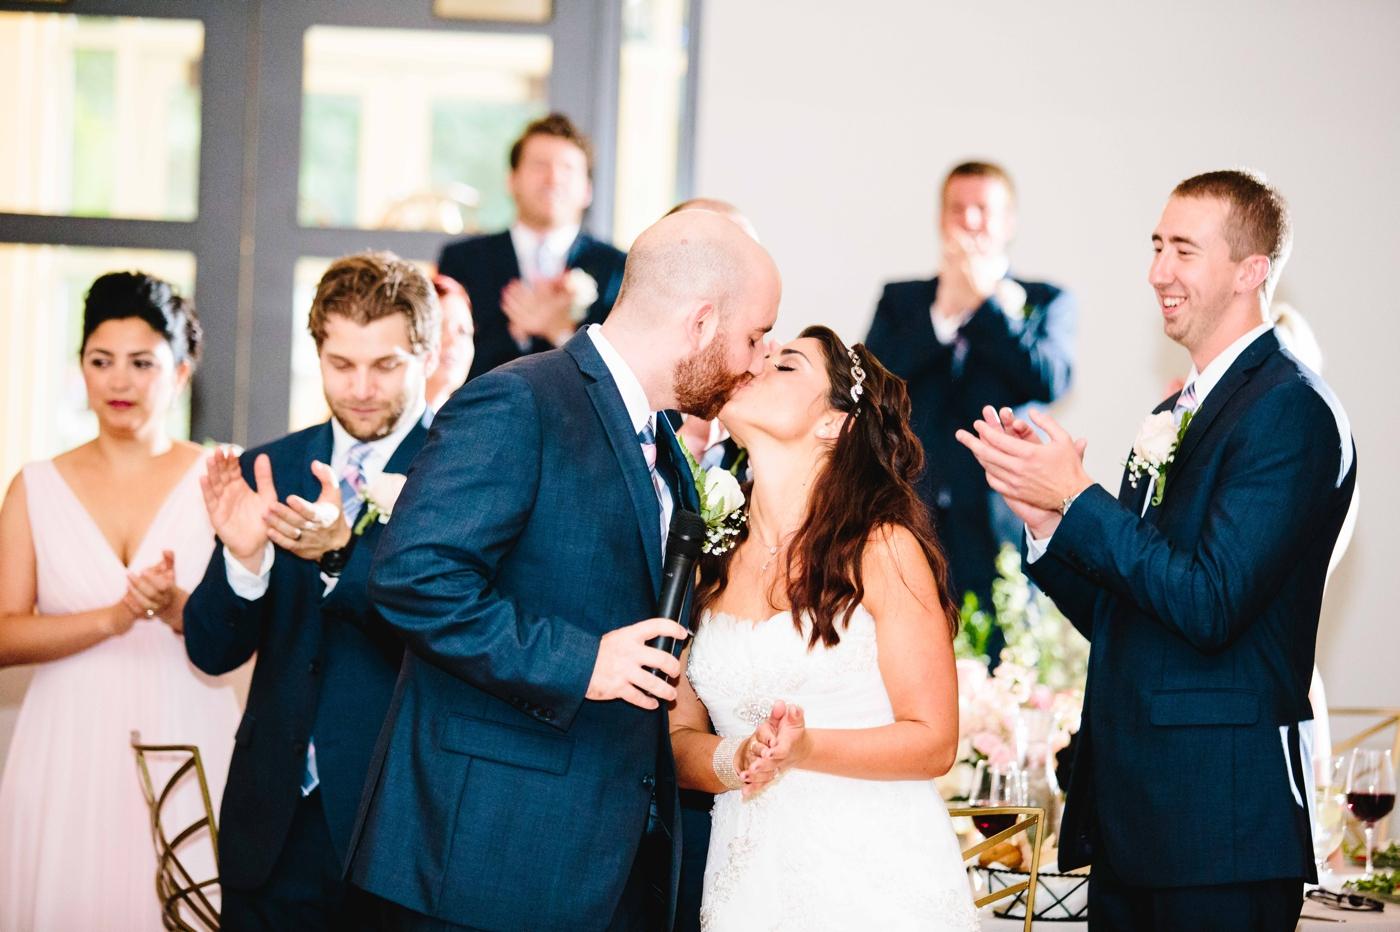 chicago-fine-art-wedding-photography-svihra19